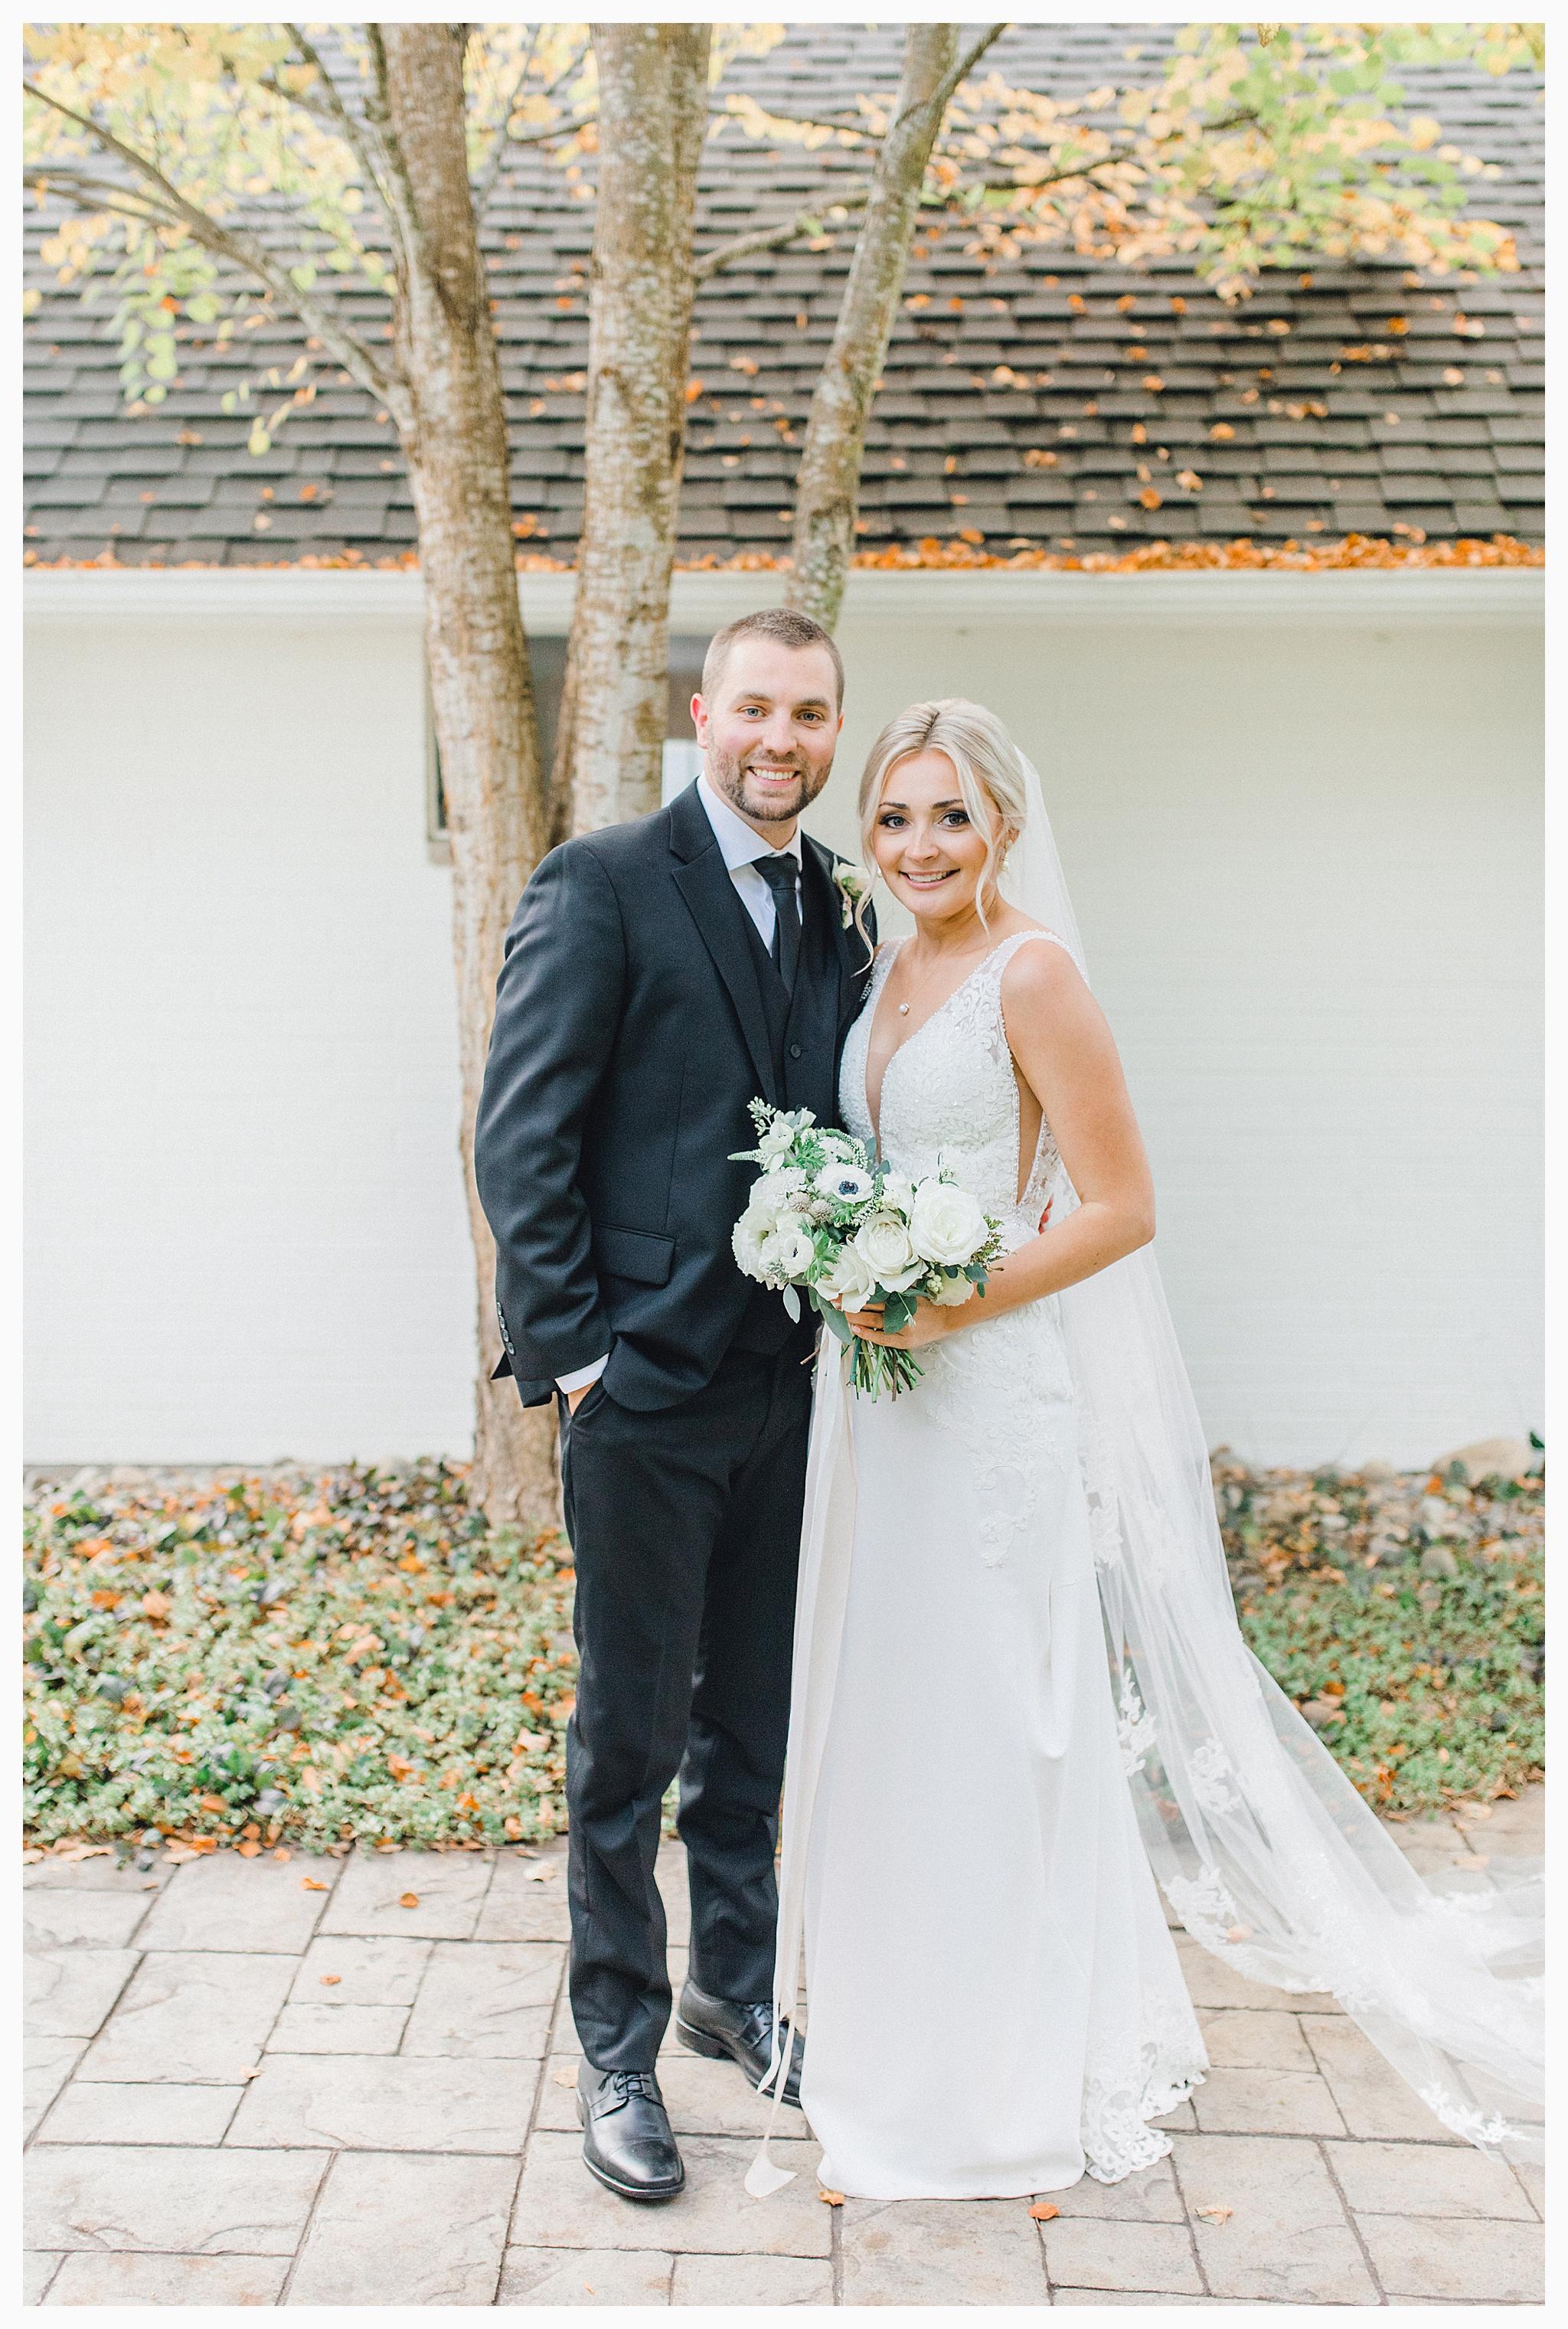 Emma Rose Company Light and Airy Wedding Photographer, Beautiful fall wedding at Rock Creek Gardens Venue in Puyallup, Washington._0081.jpg